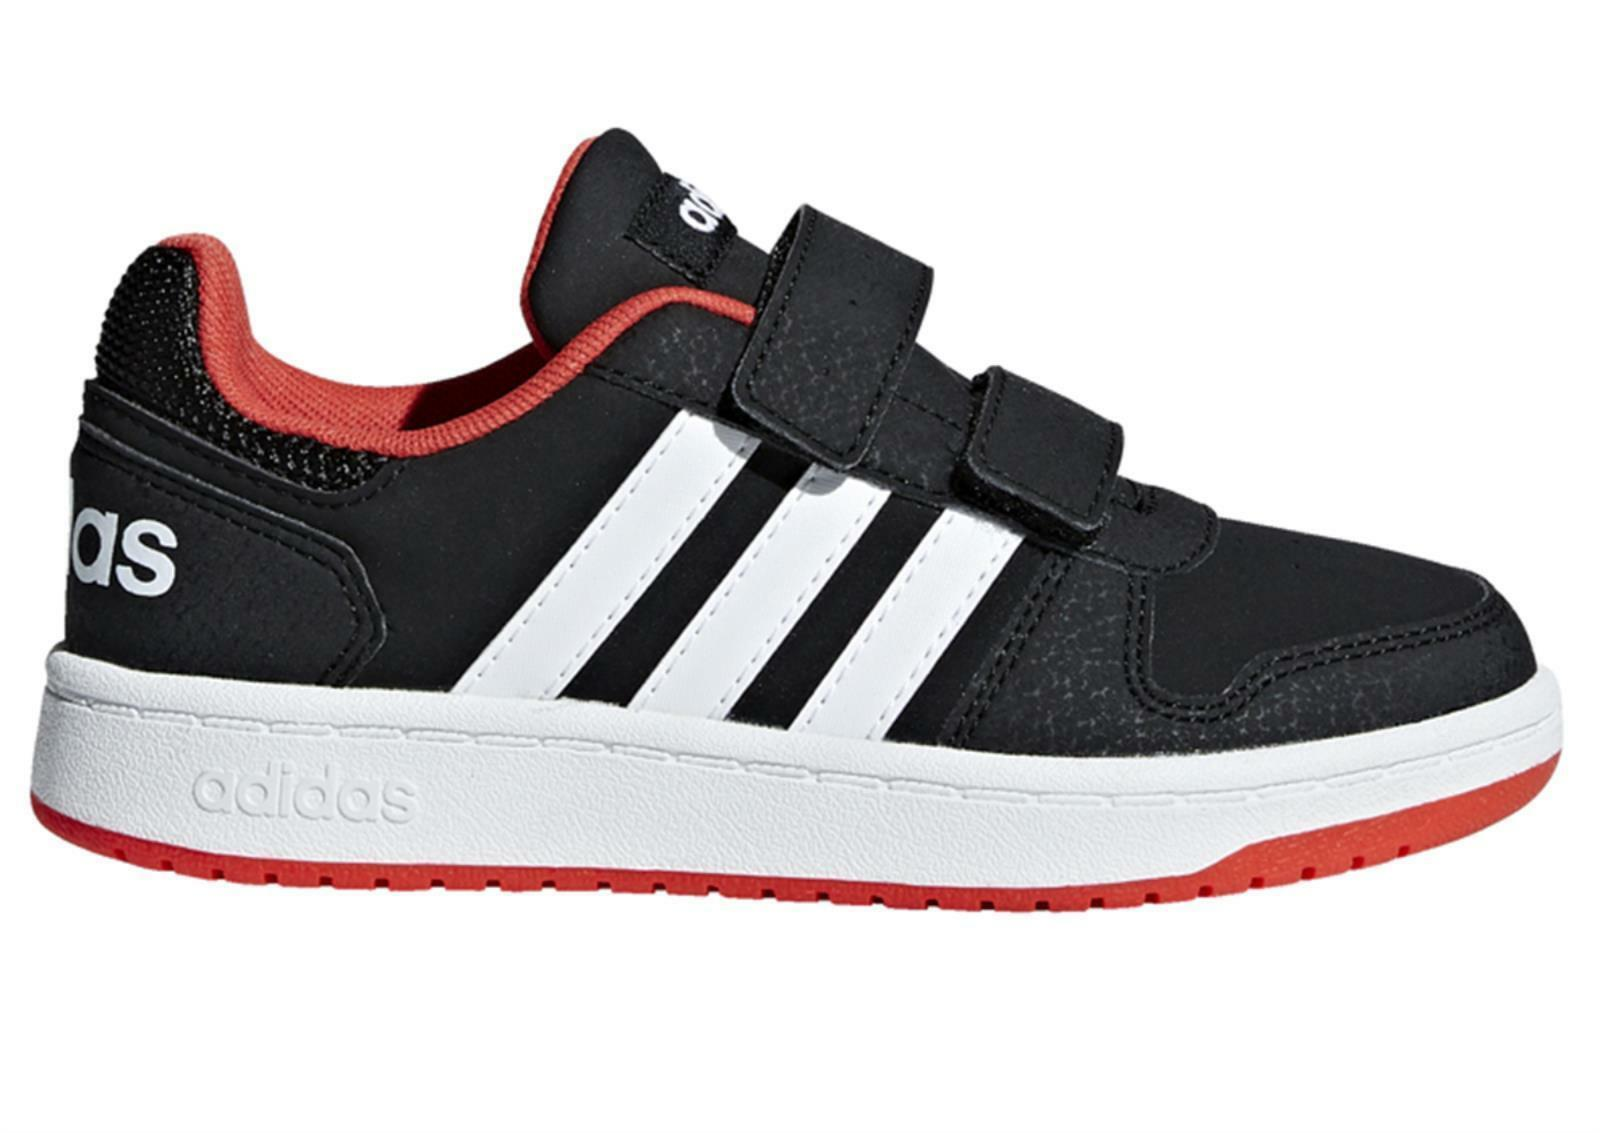 adidas hoops 2.0 cmf i bambino strappo sportivo  b75965 nero